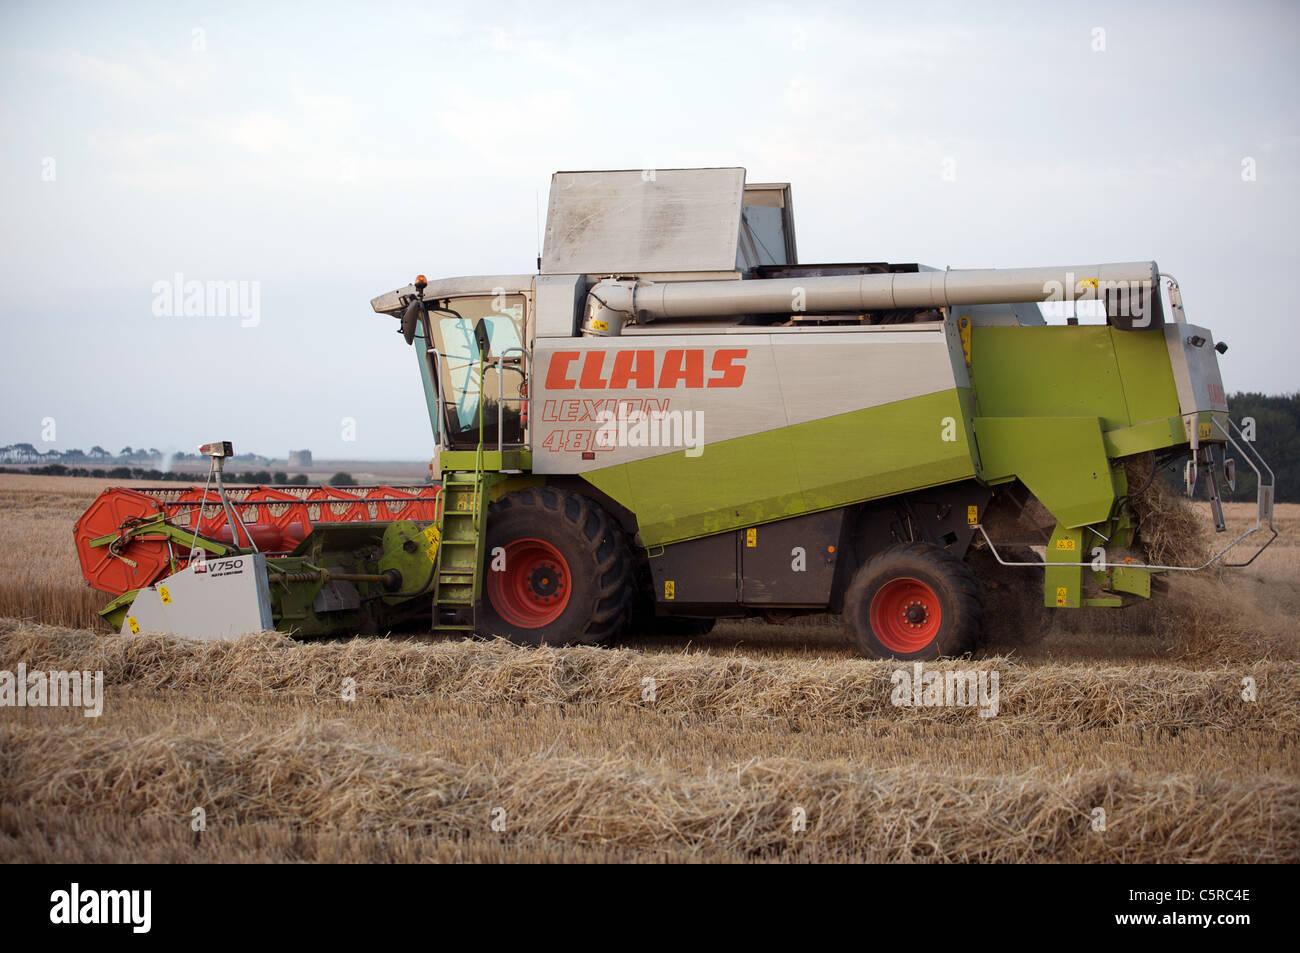 Class Lexion 480 combine harvester - Stock Image